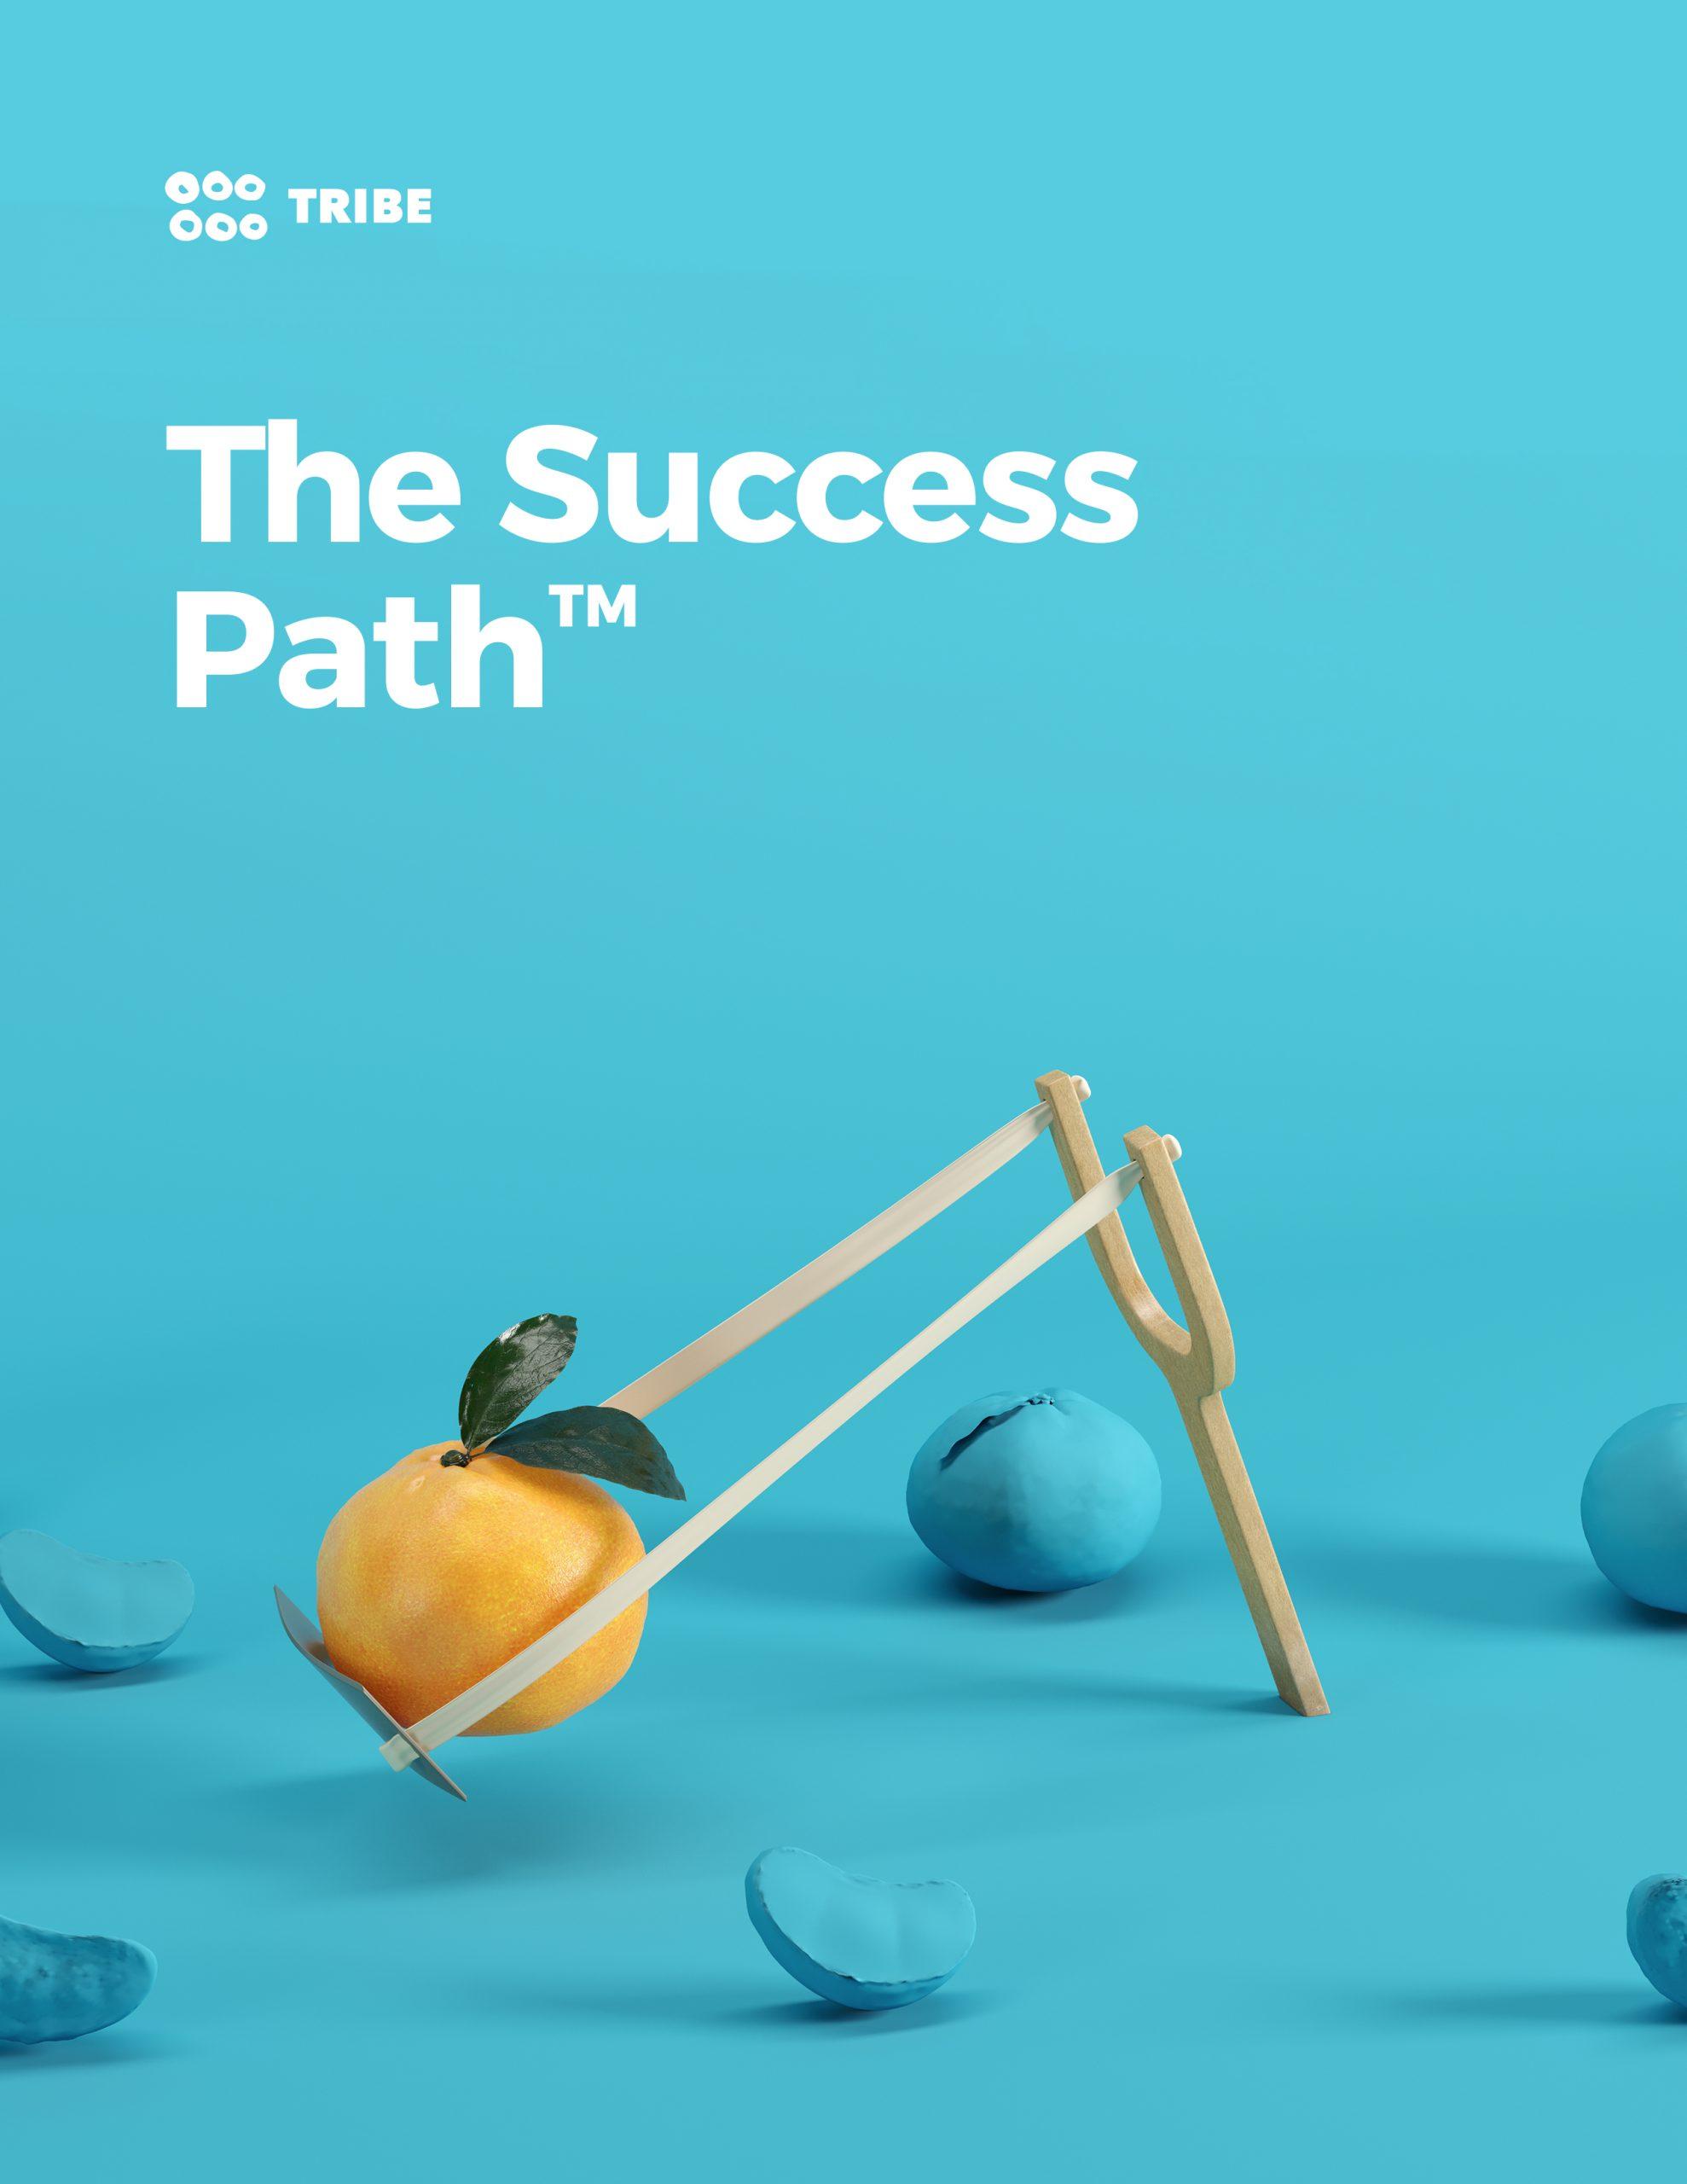 The Success Path